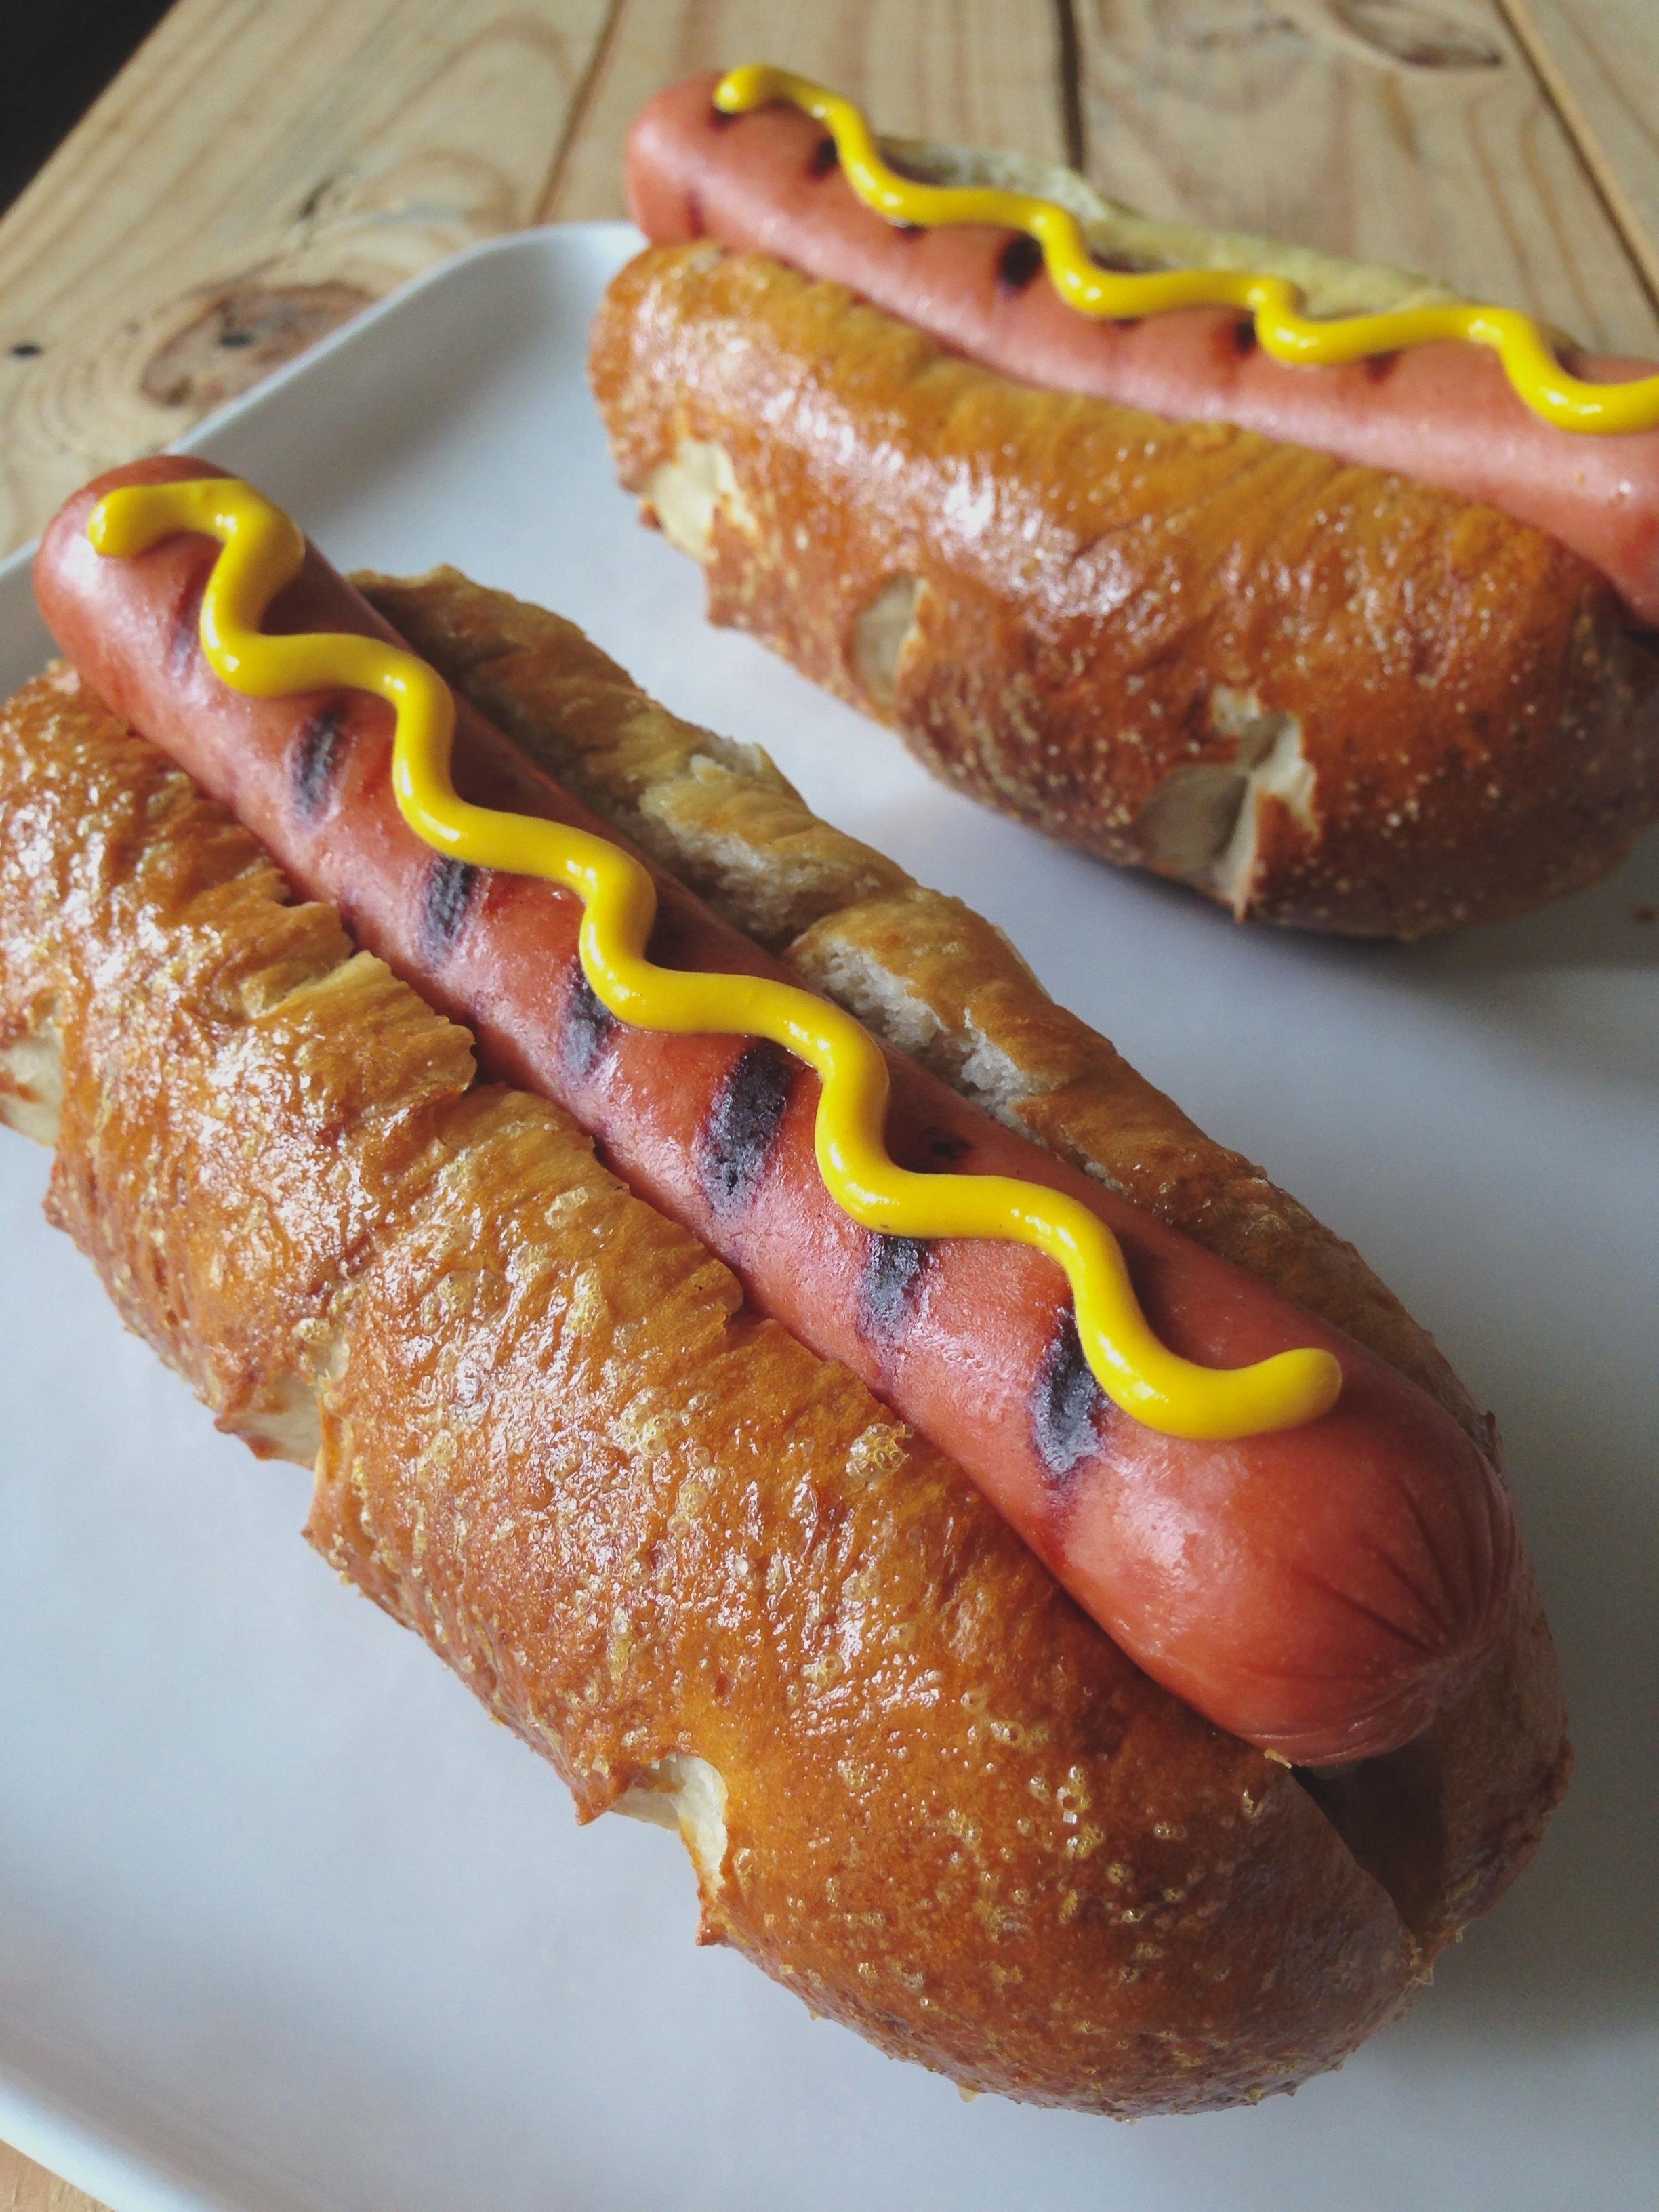 Easy Pretzel Hot Dog Buns 8 – 10 buns